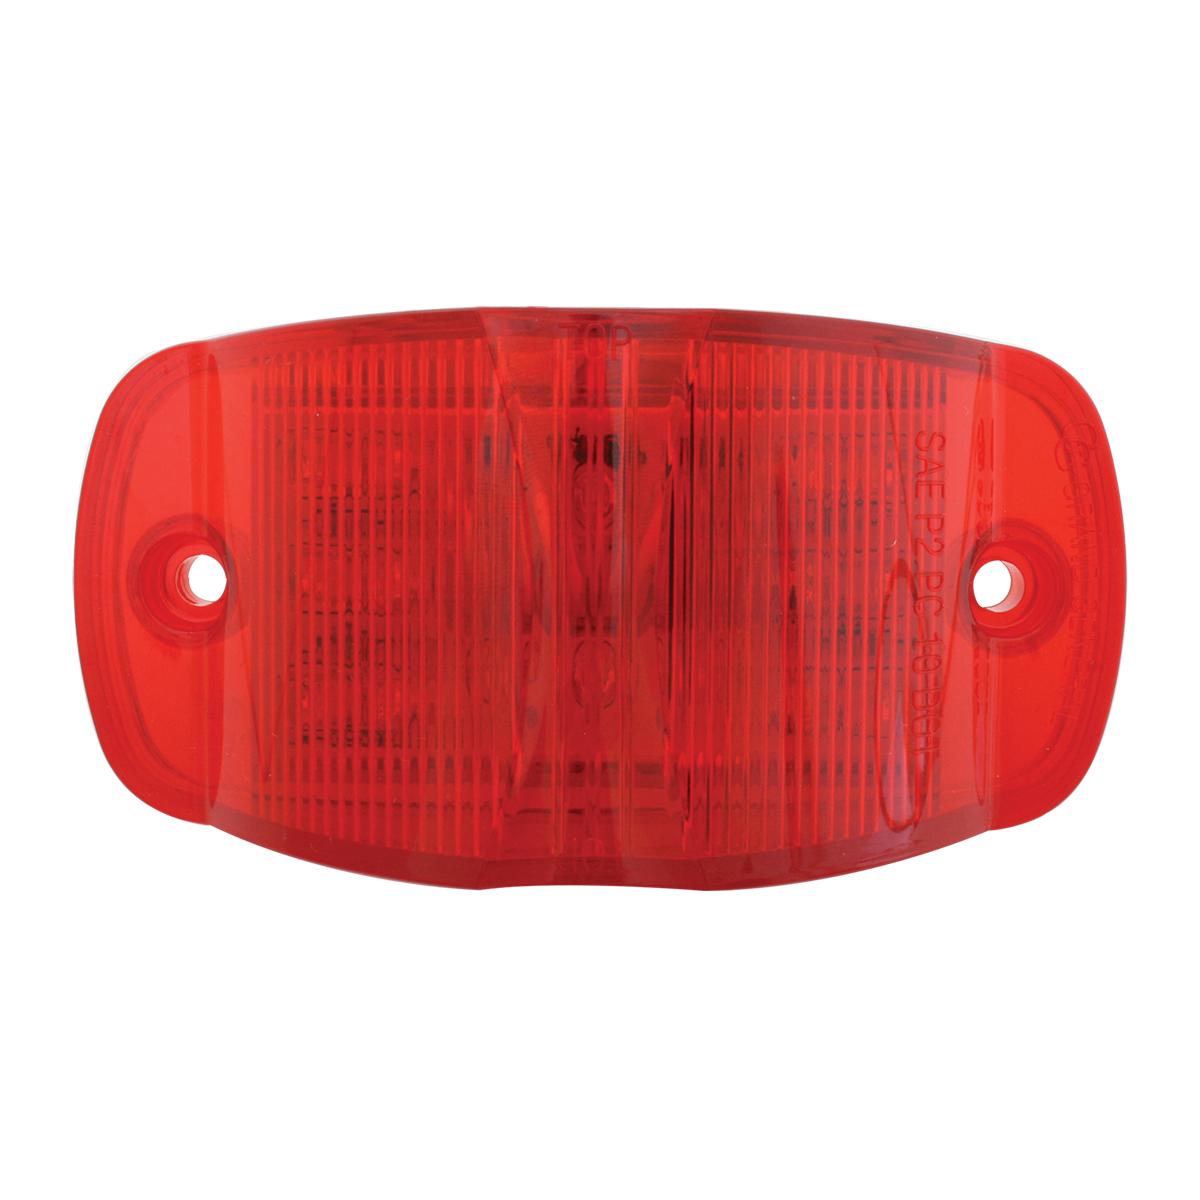 Rectangular Camel Back Wide Angle LED Marker Light in Red/Red